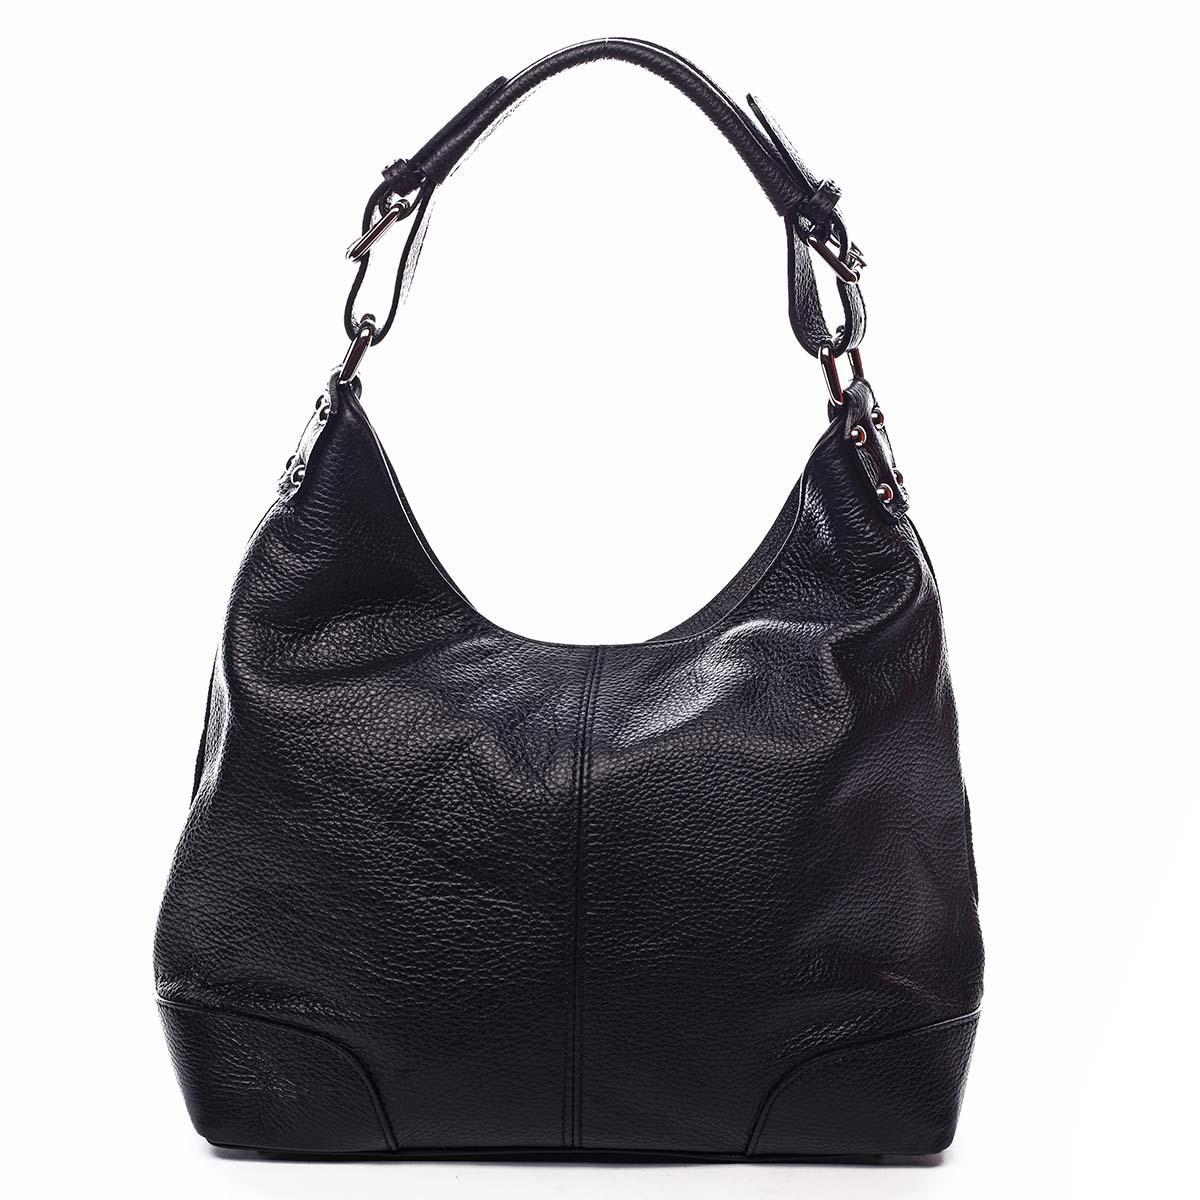 Dámska kožená kabelka čierna - ItalY Inpelle čierna